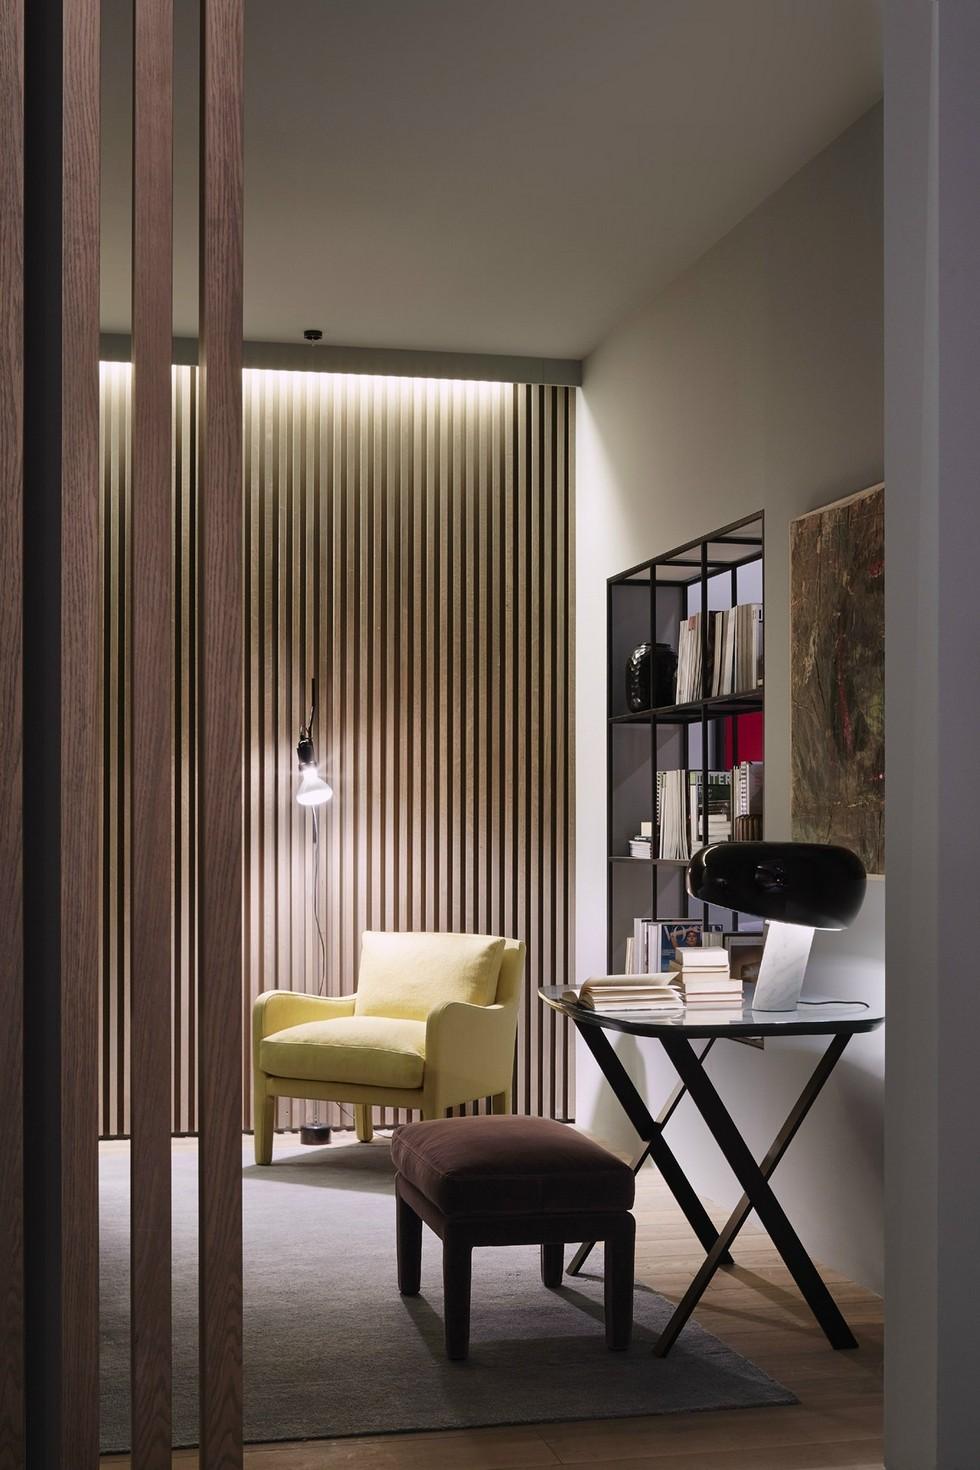 Milan Furniture Fair 2015 Living Room Furniture Ideas To Have In Mind Milan Design Agenda